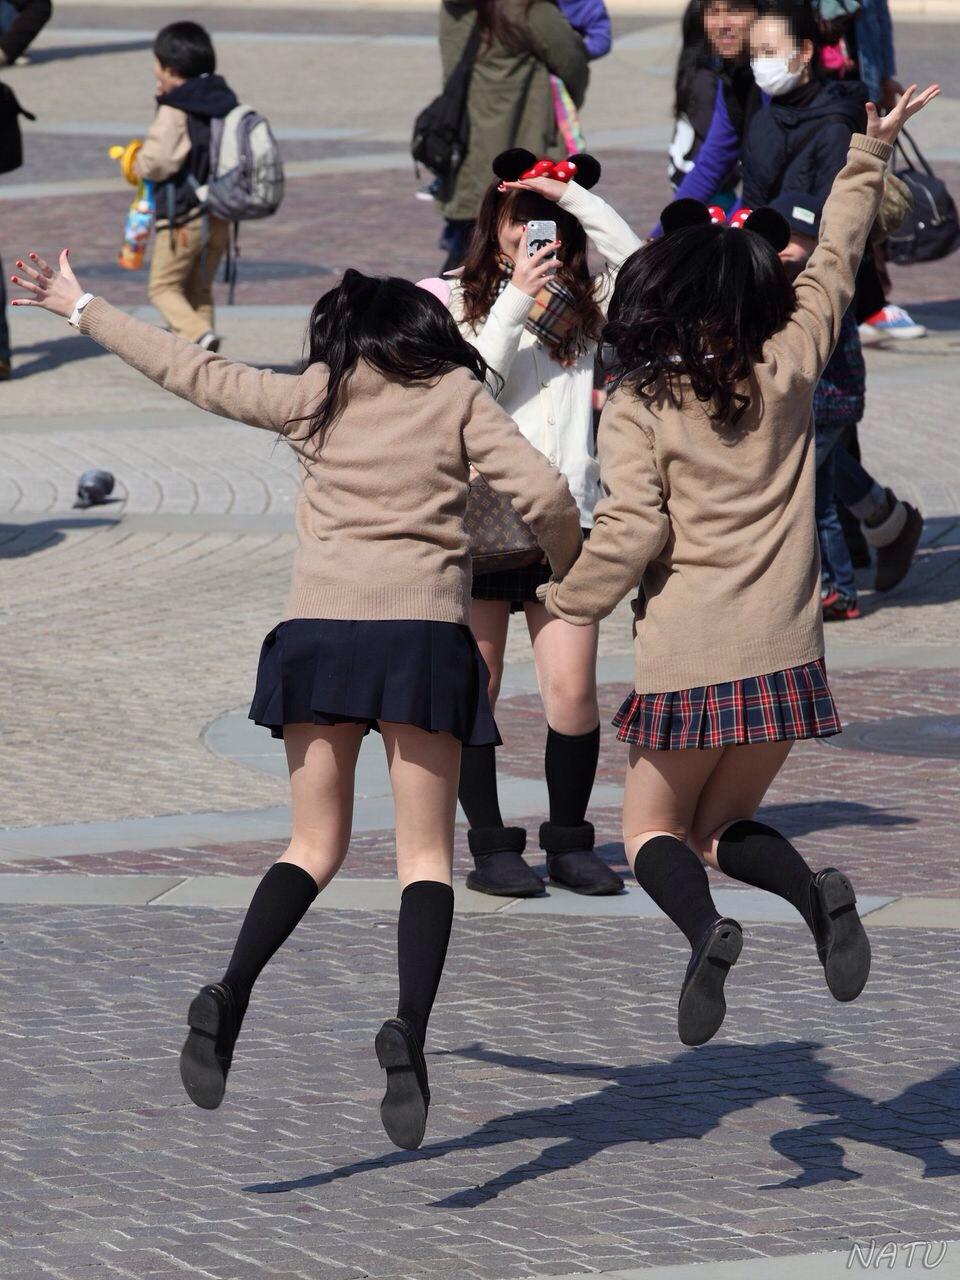 JKエロ画像でも見て嫌なことは忘れちゃおーぜぇー!!!!!!!!!!! 0lFJSNf